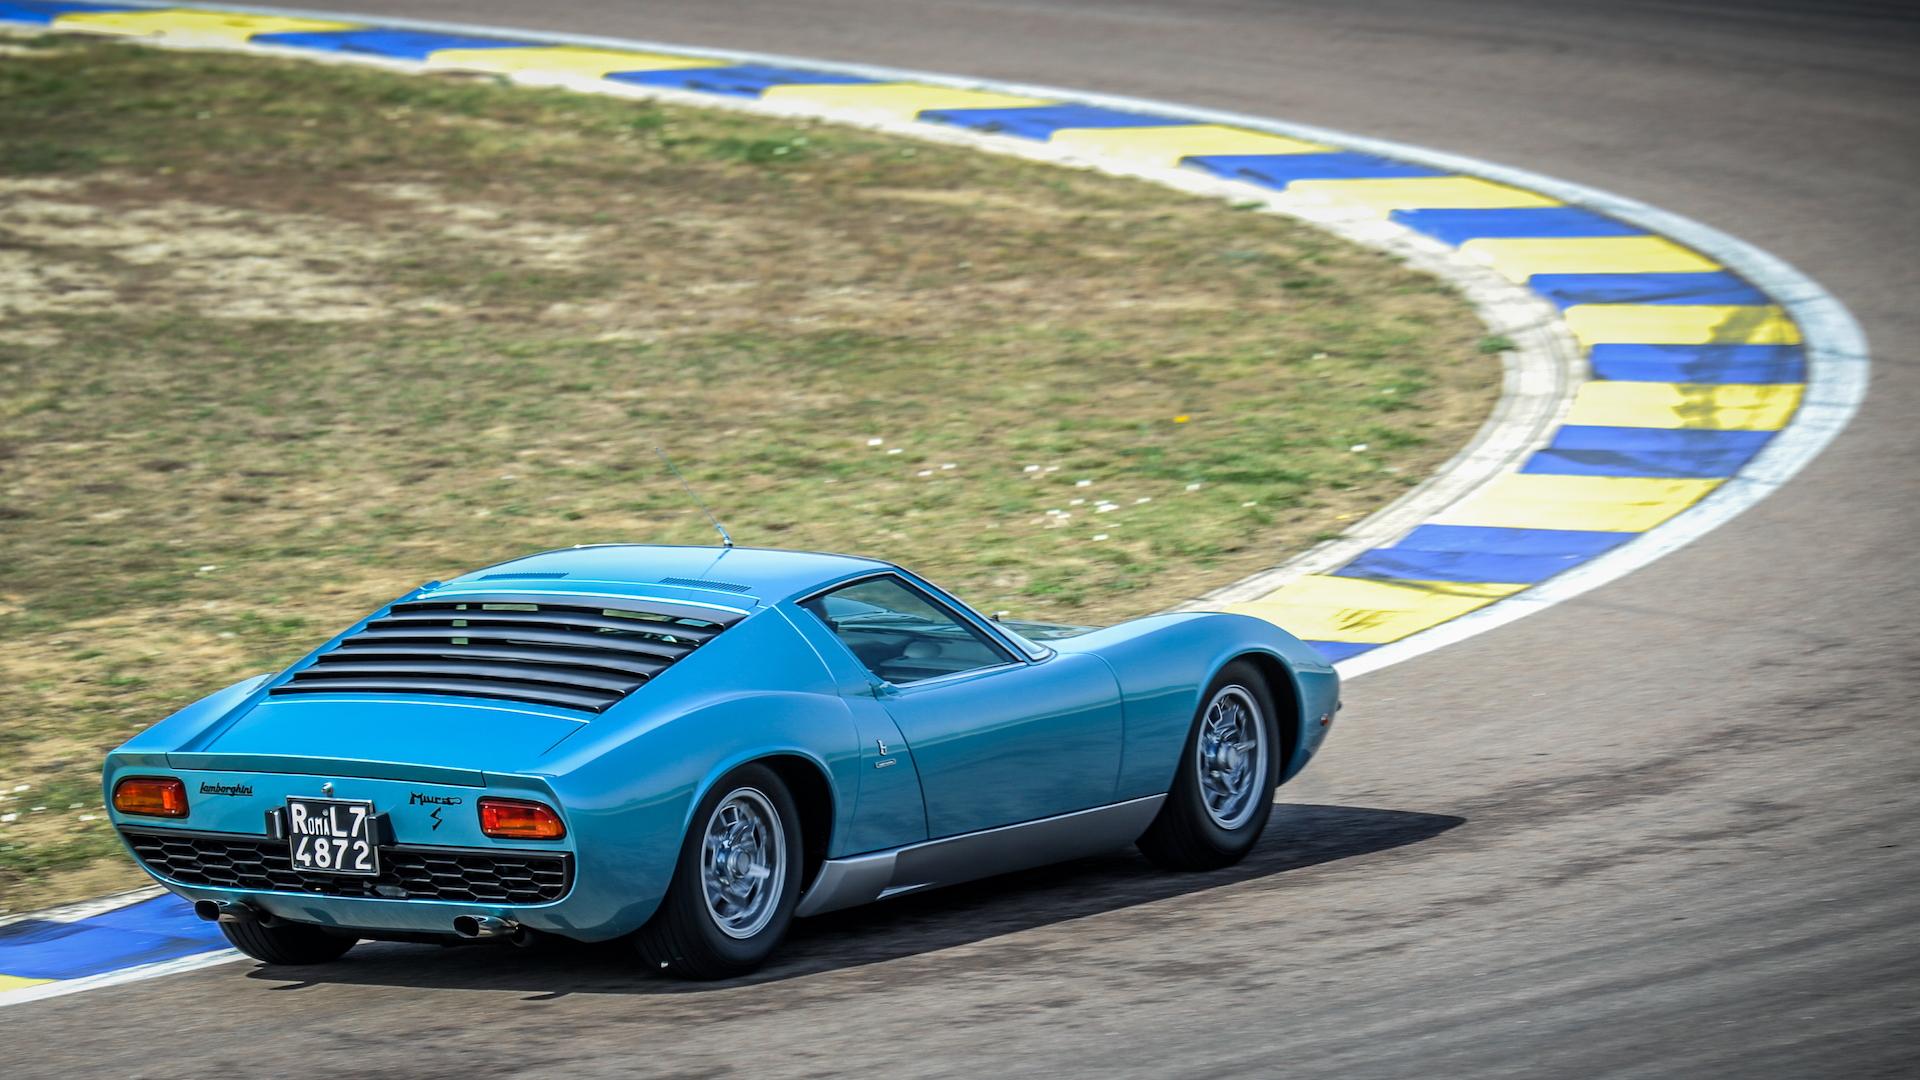 Singer Little Tony S Lamborghini Miura Restored In Beautiful Rare